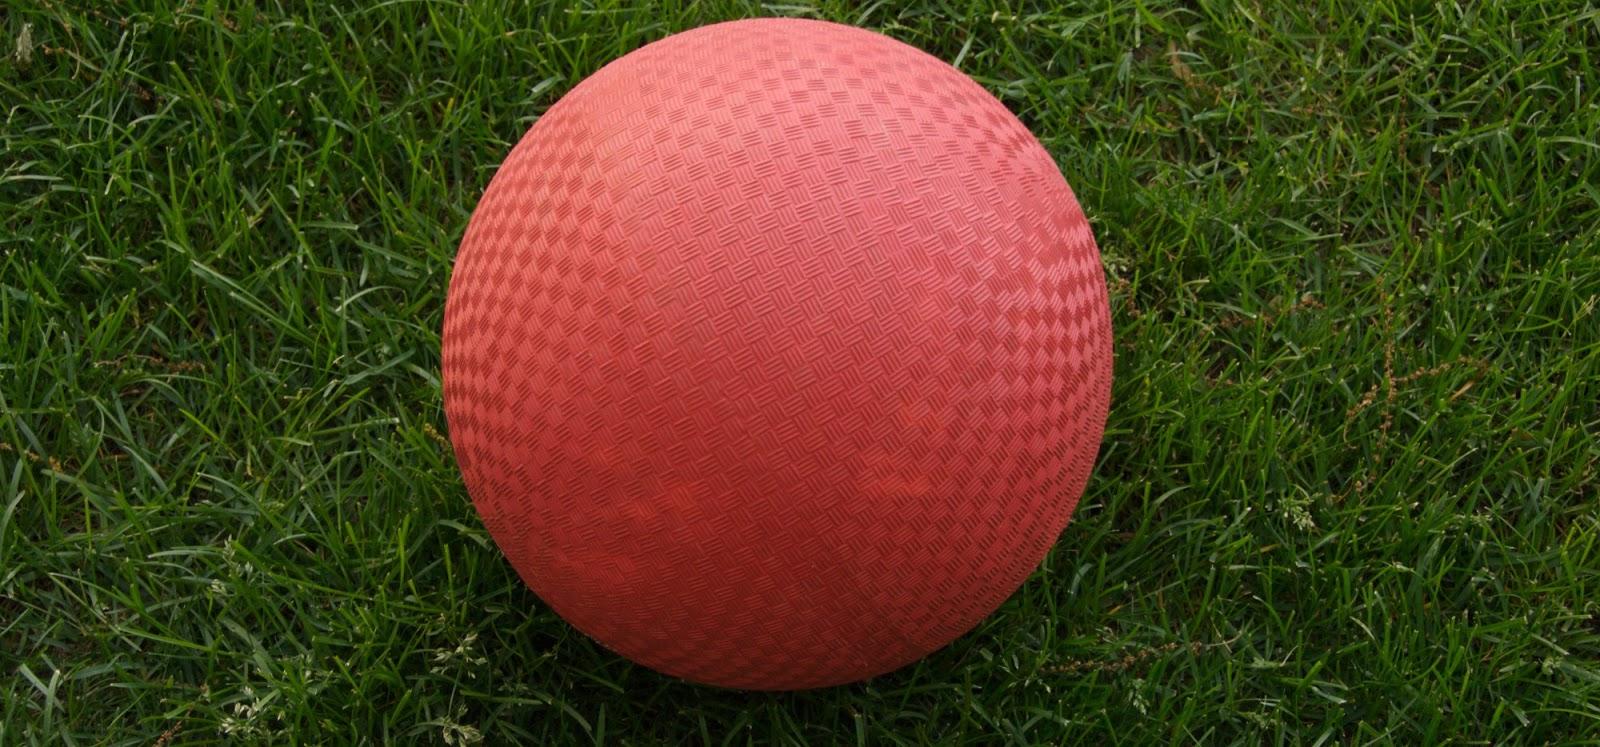 GO Kickball  Rules